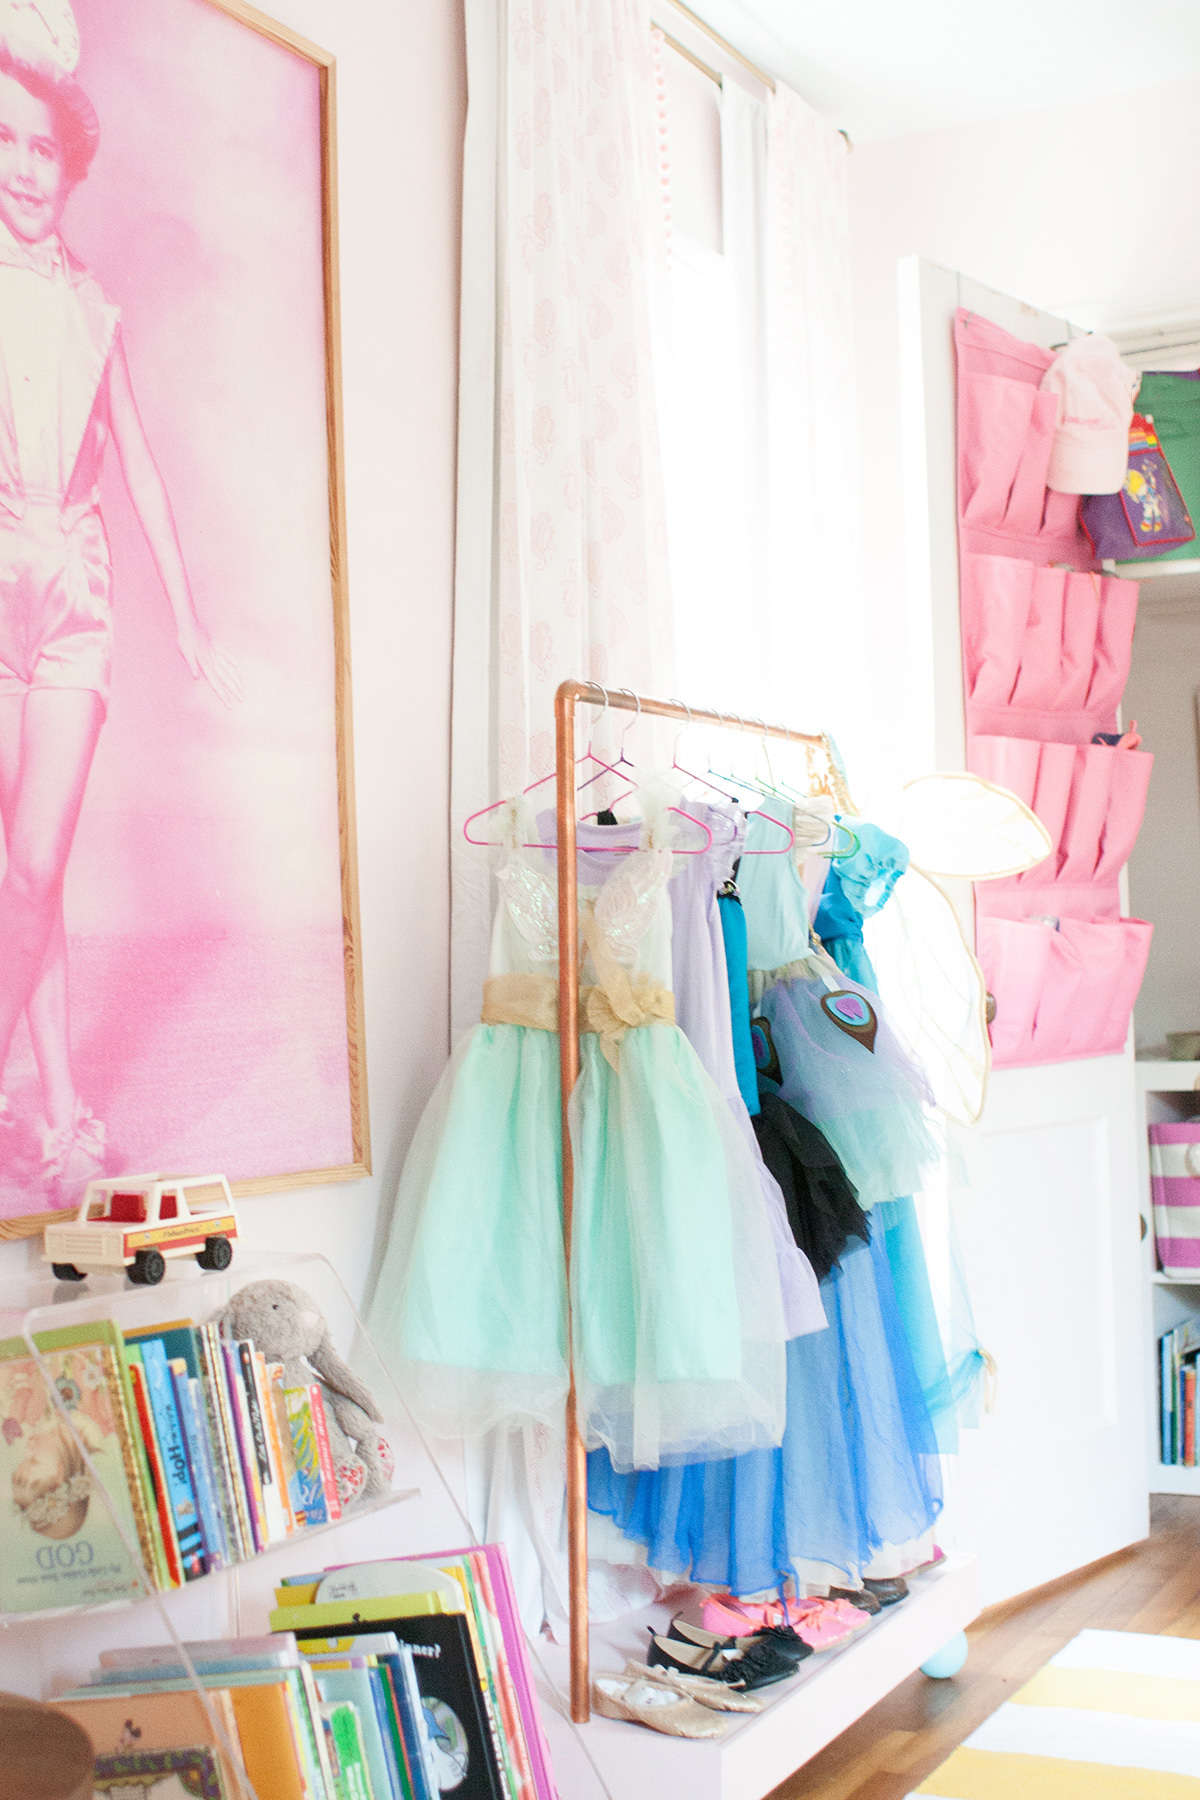 Dress Up Bedroom chevroletsoccercom